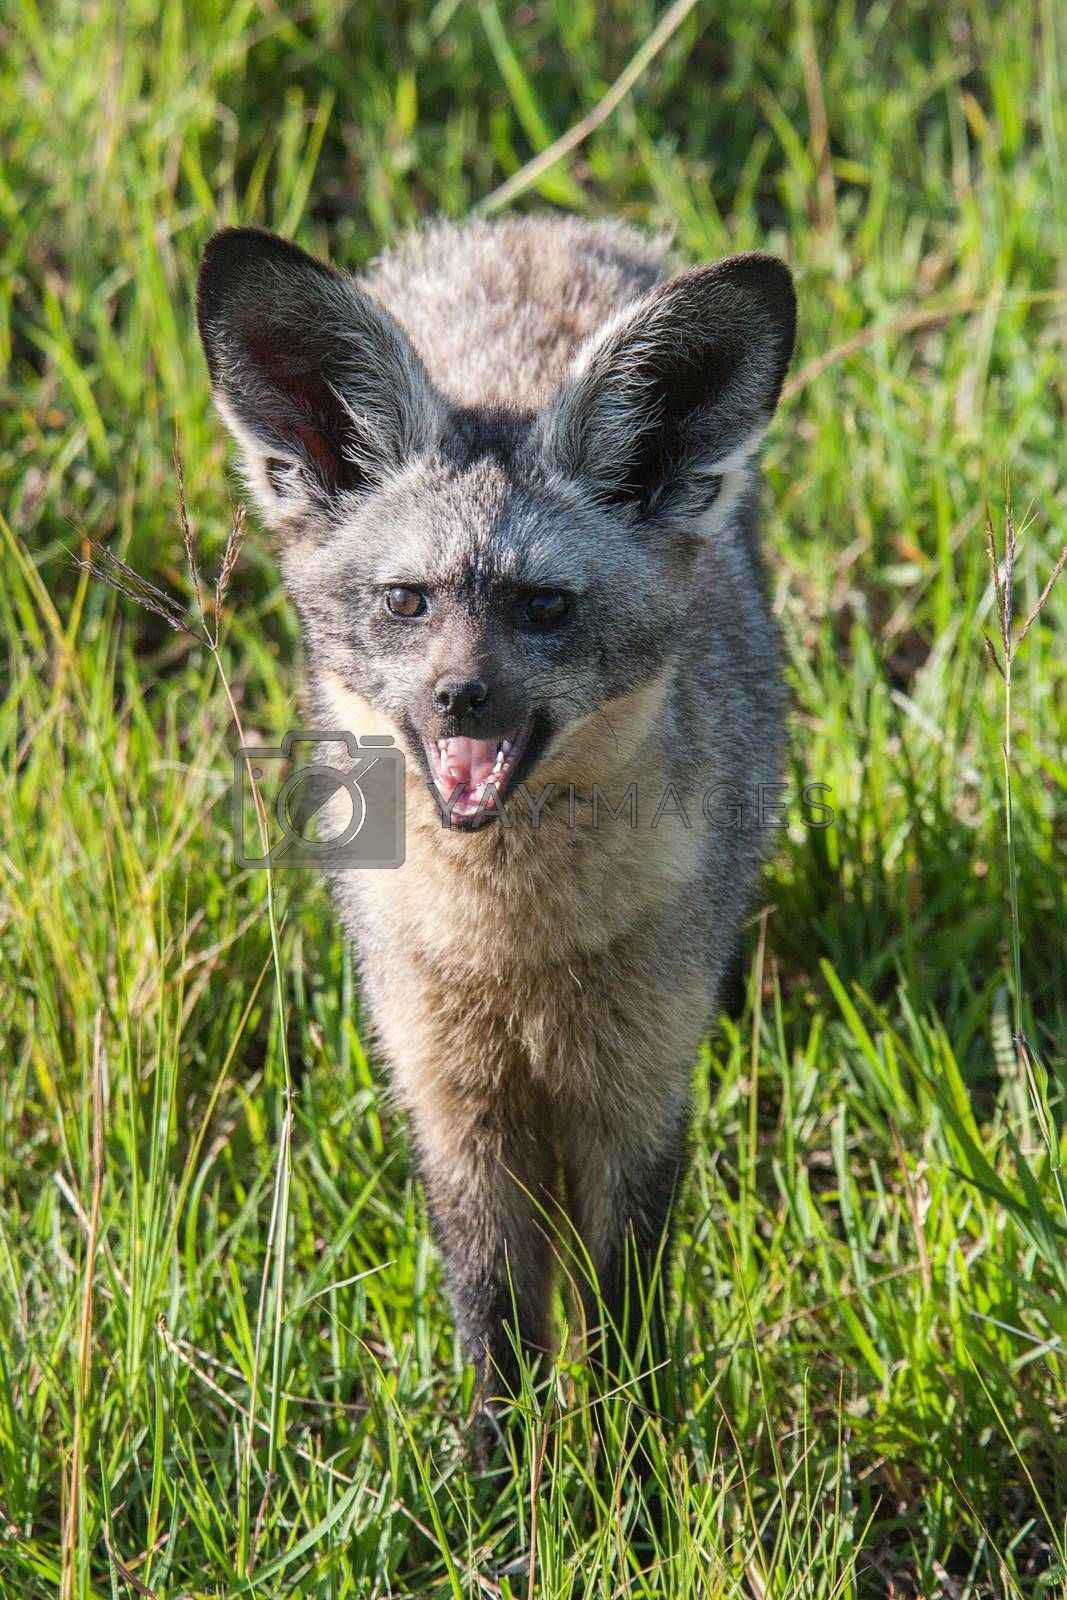 Royalty free image of Bat Eared Fox by ajn